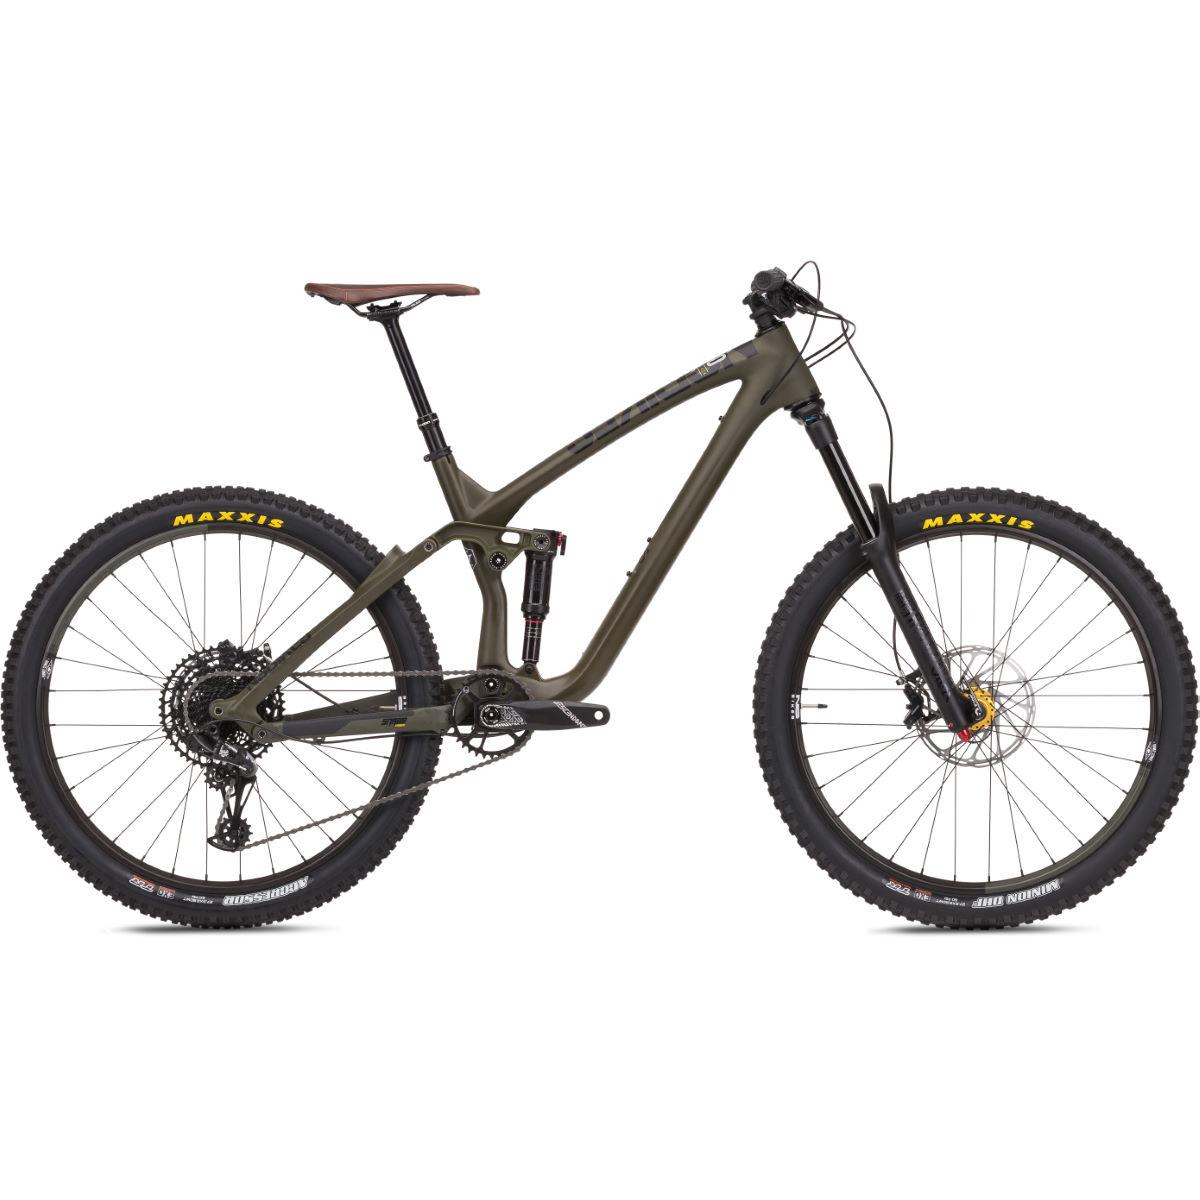 NS Bikes Snabb 160 C Full